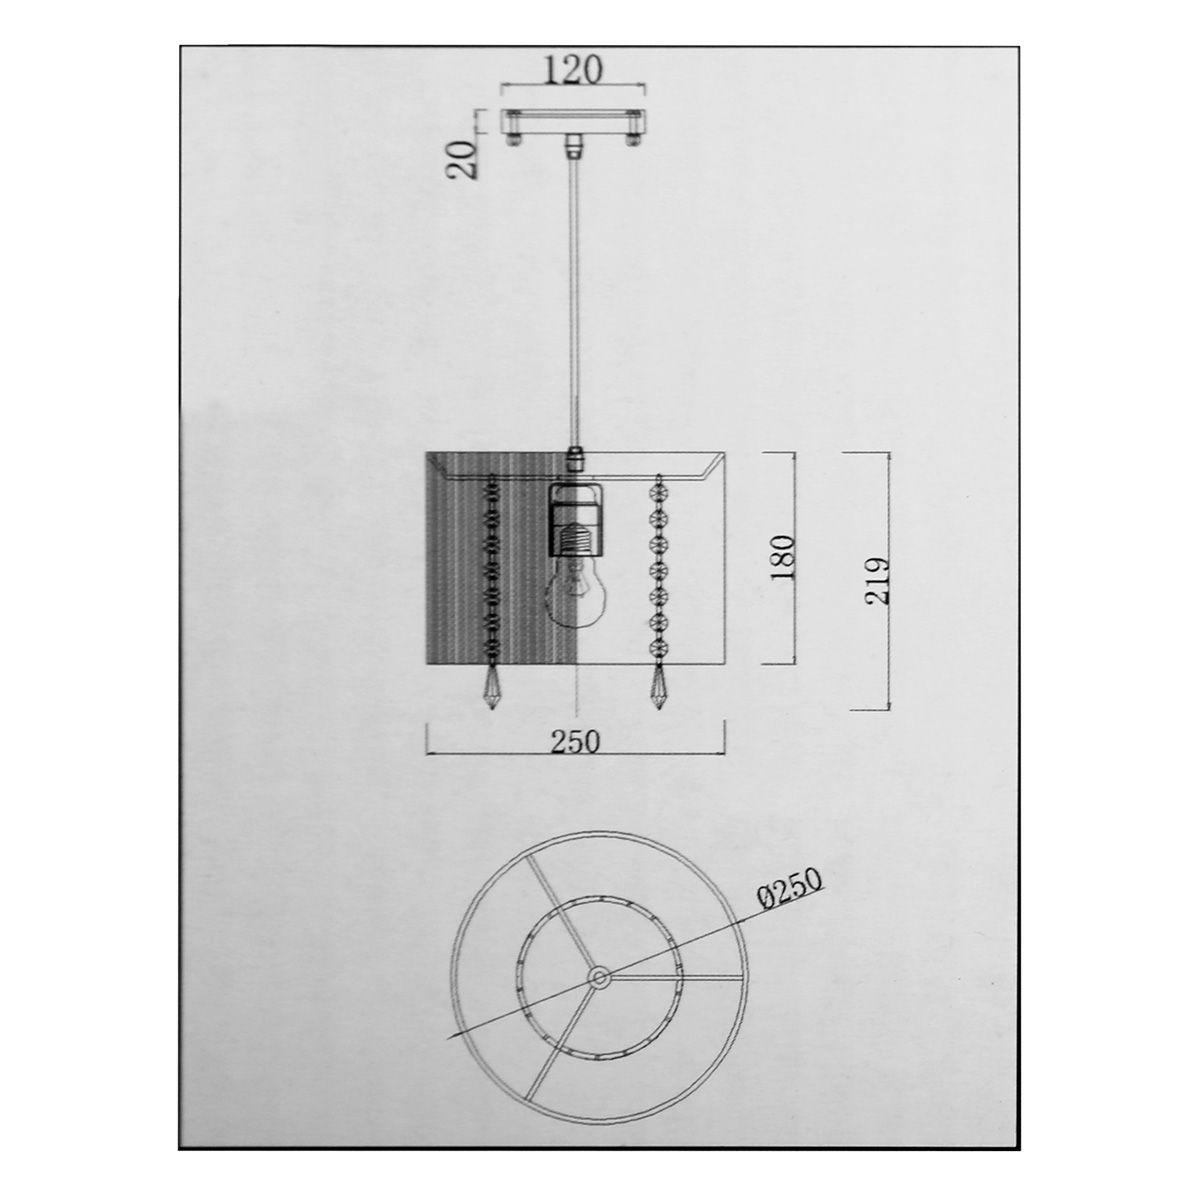 Pendente Rammer 25cm Circular E-27 1 Lamp. Max 60w Prata